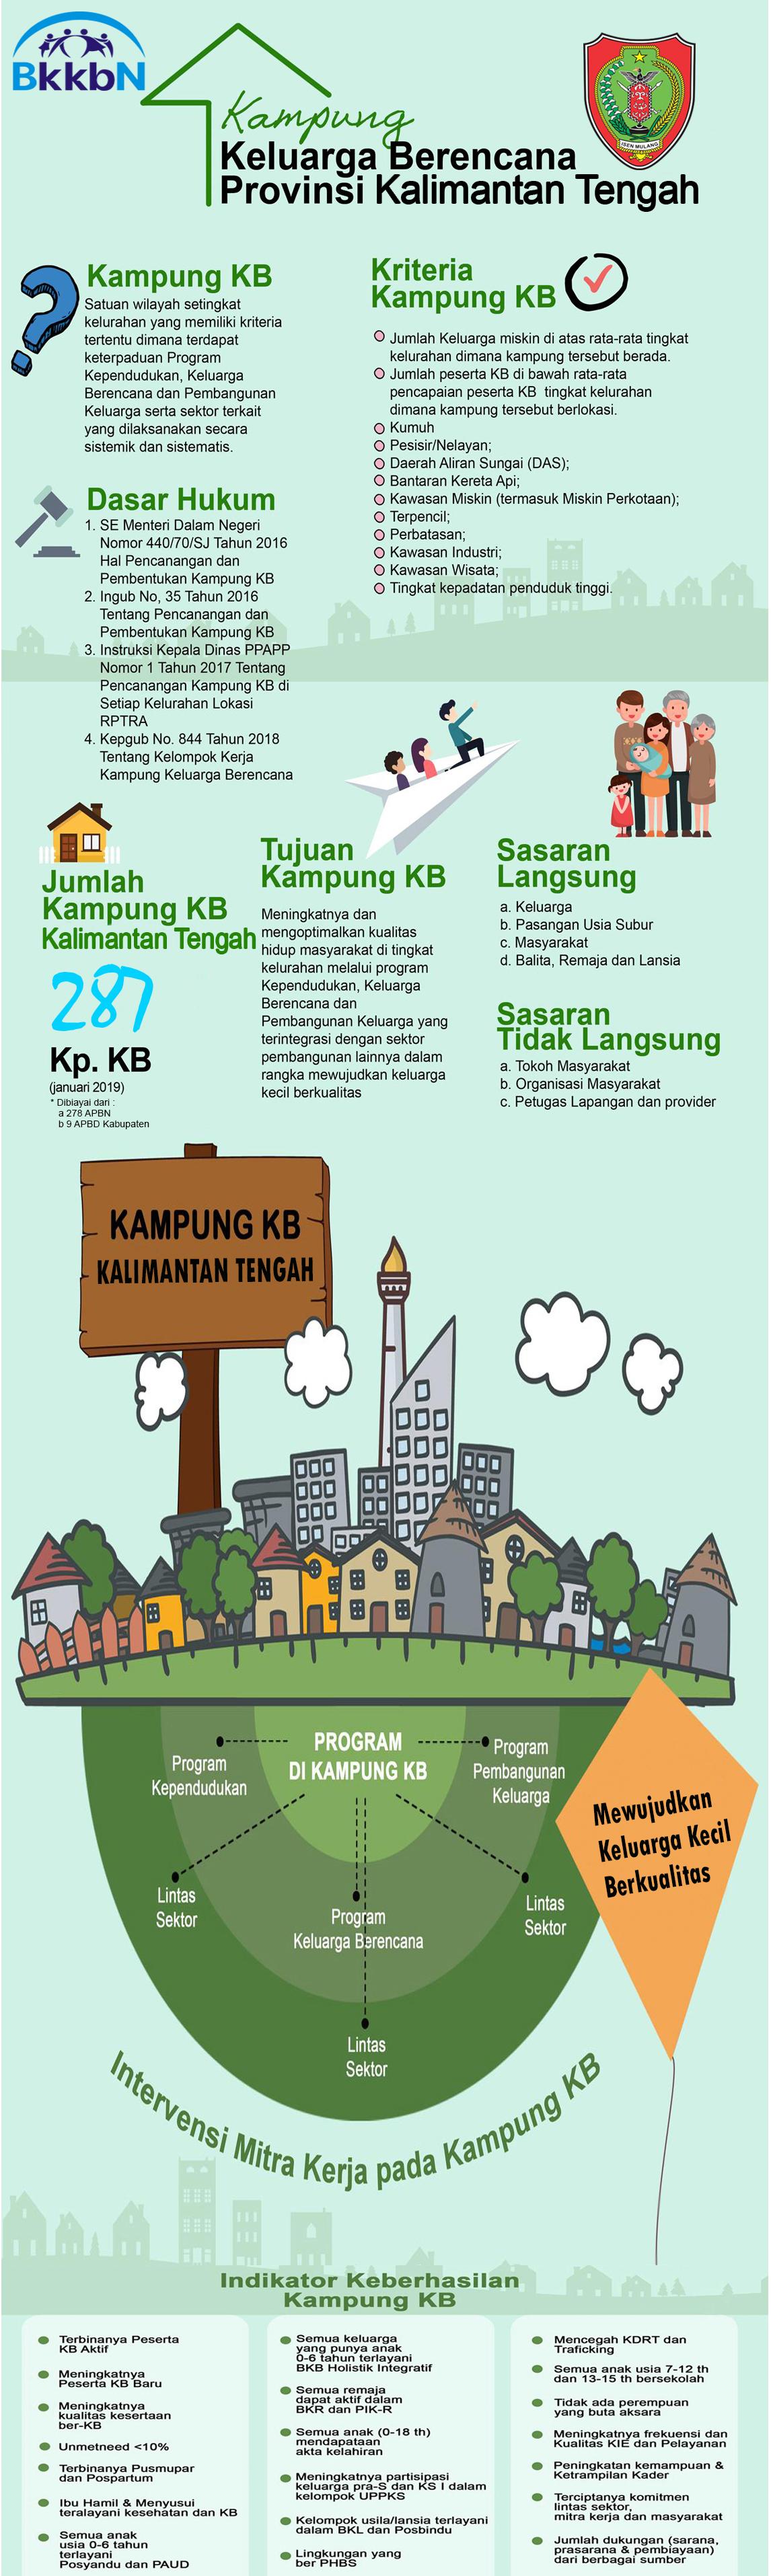 BKKBN Kampung Keluarga Berencana Provinsi Kalimantan Tengah